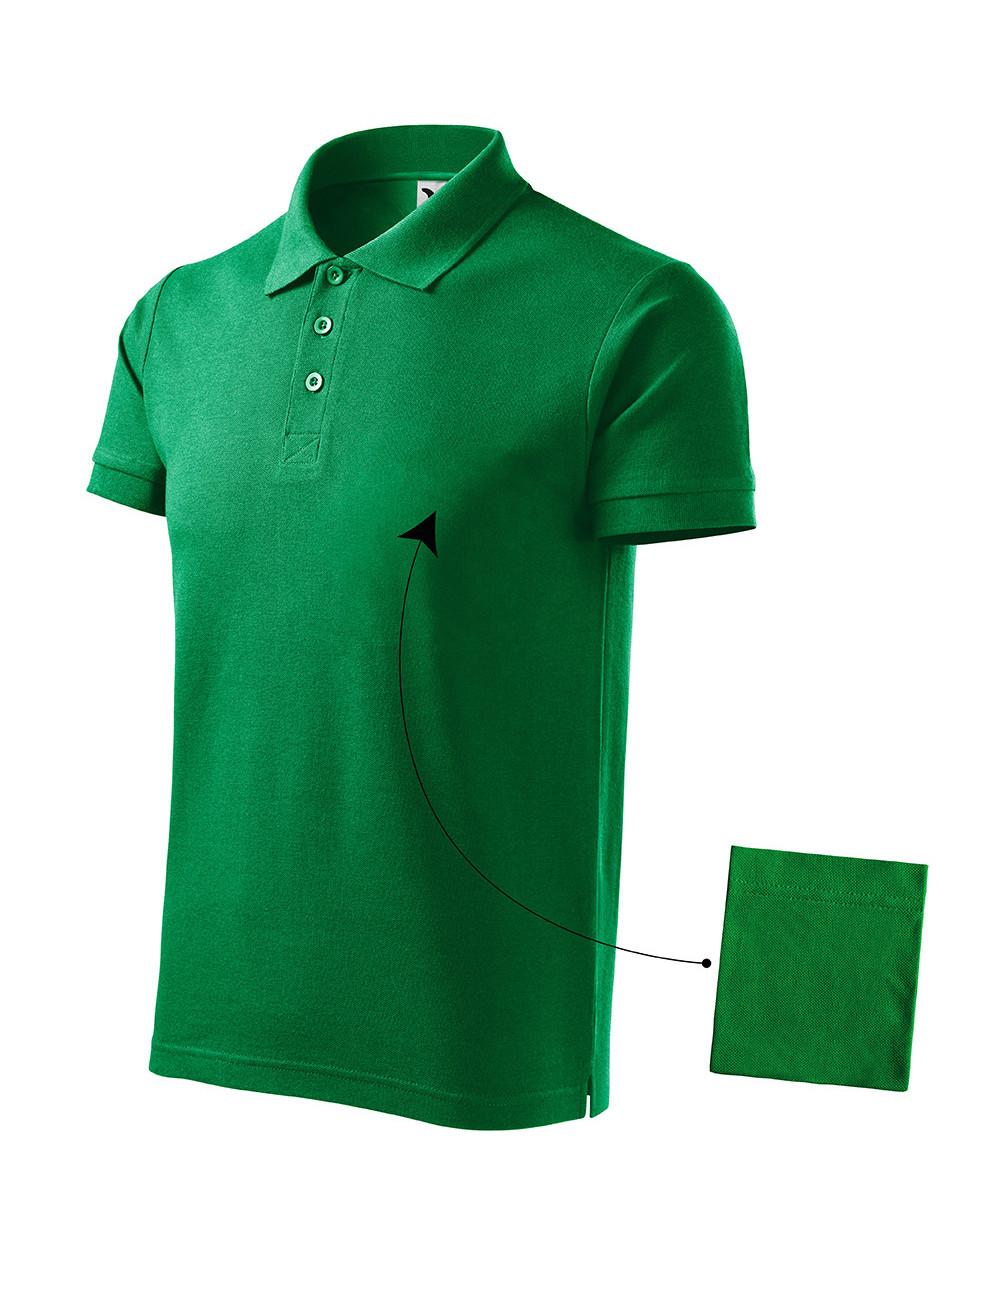 Adler MALFINI Koszulka polo męska Cotton 212 zieleń trawy